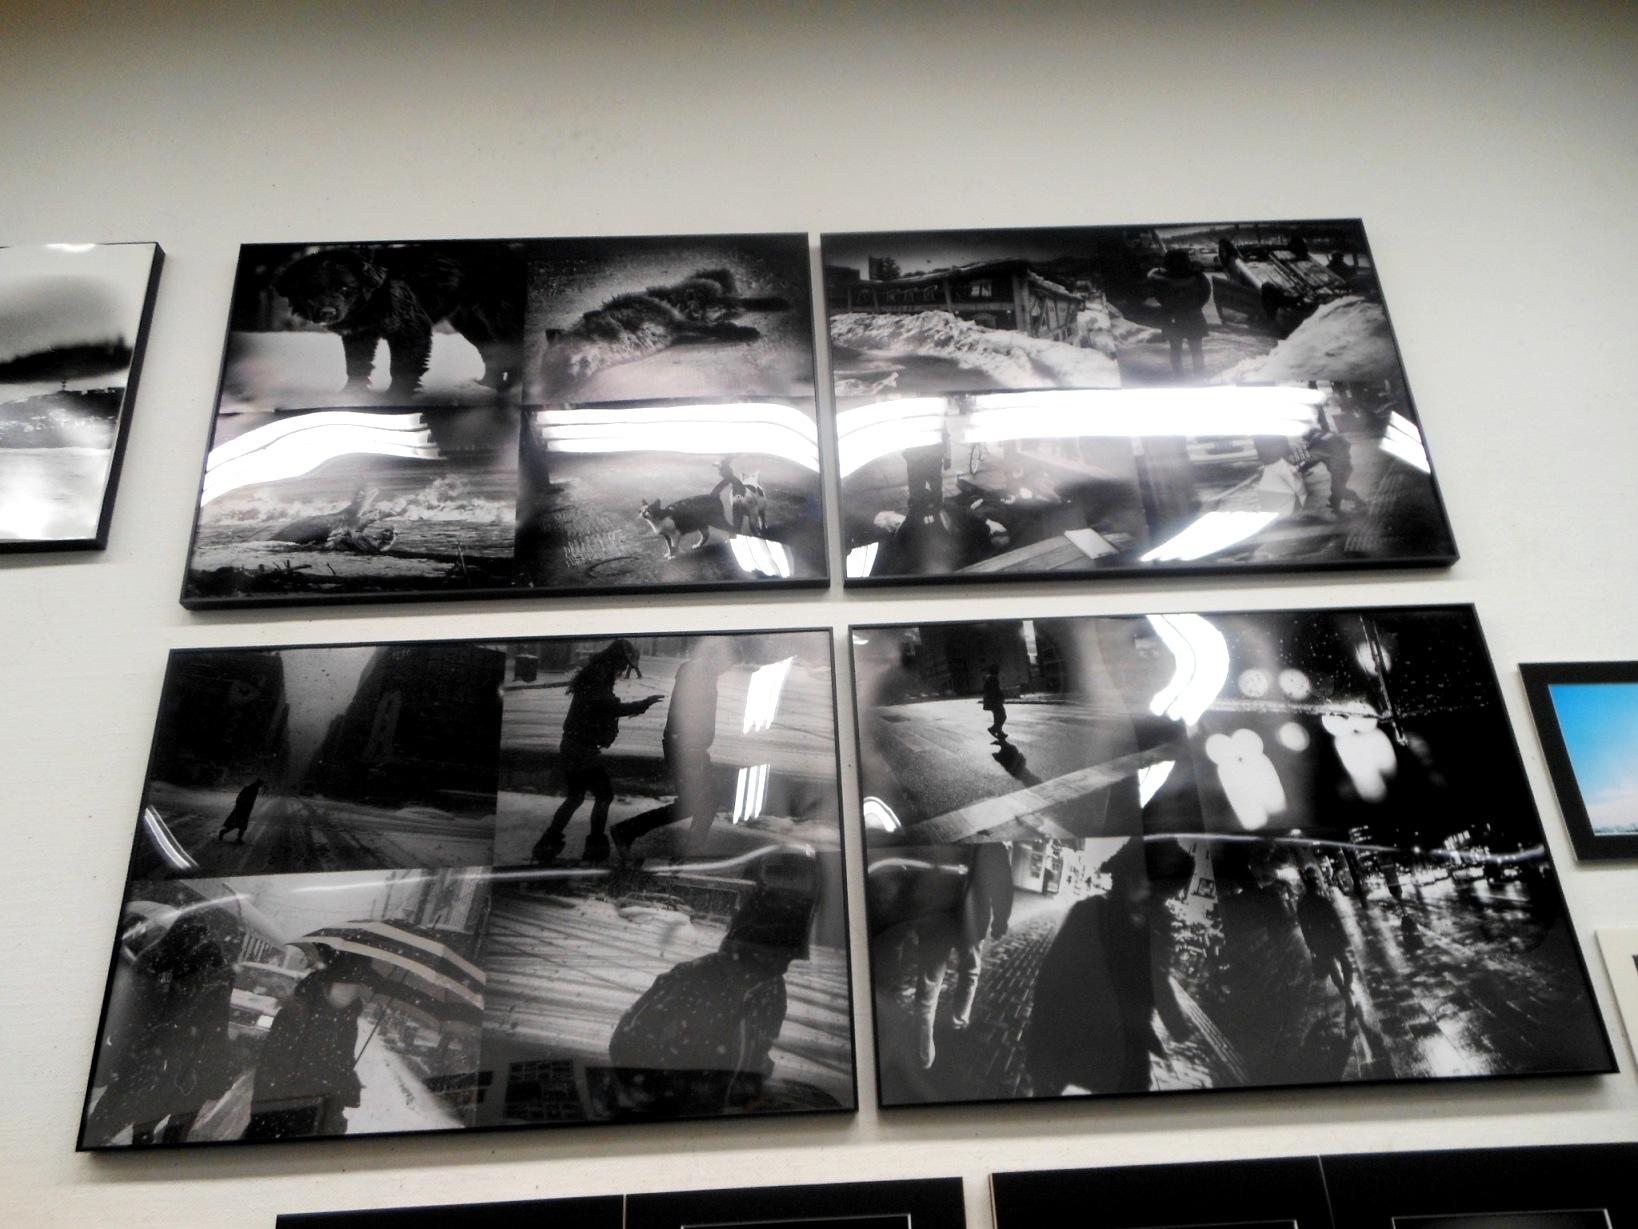 1885)②「写真クラブ「BePHaT!!」 第9回作品展 『夢 Photo 2012』」市民g. 終了11月21日(水)~11月25日(日)_f0126829_22205113.jpg